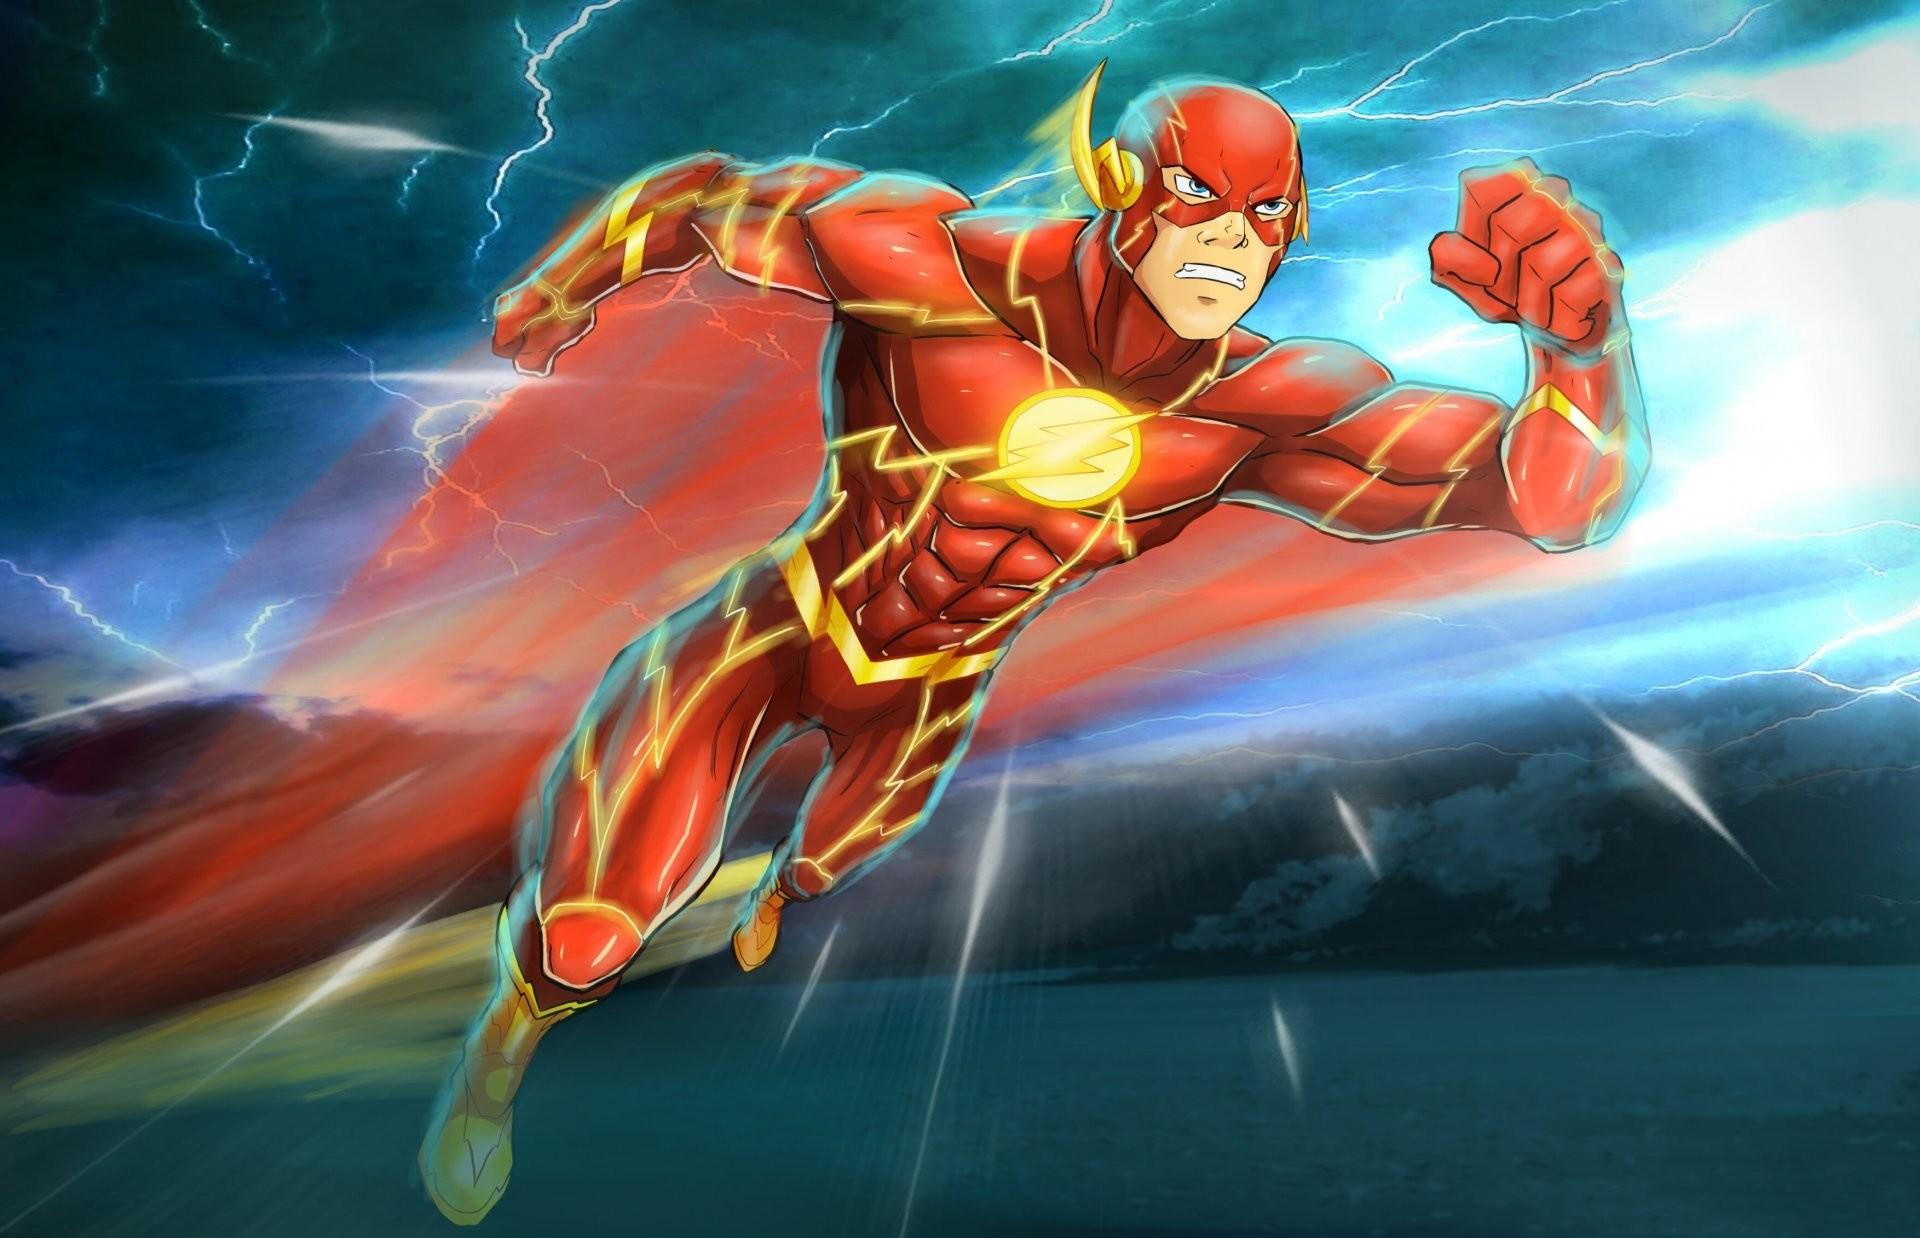 flash superhero wallpaper 66 images